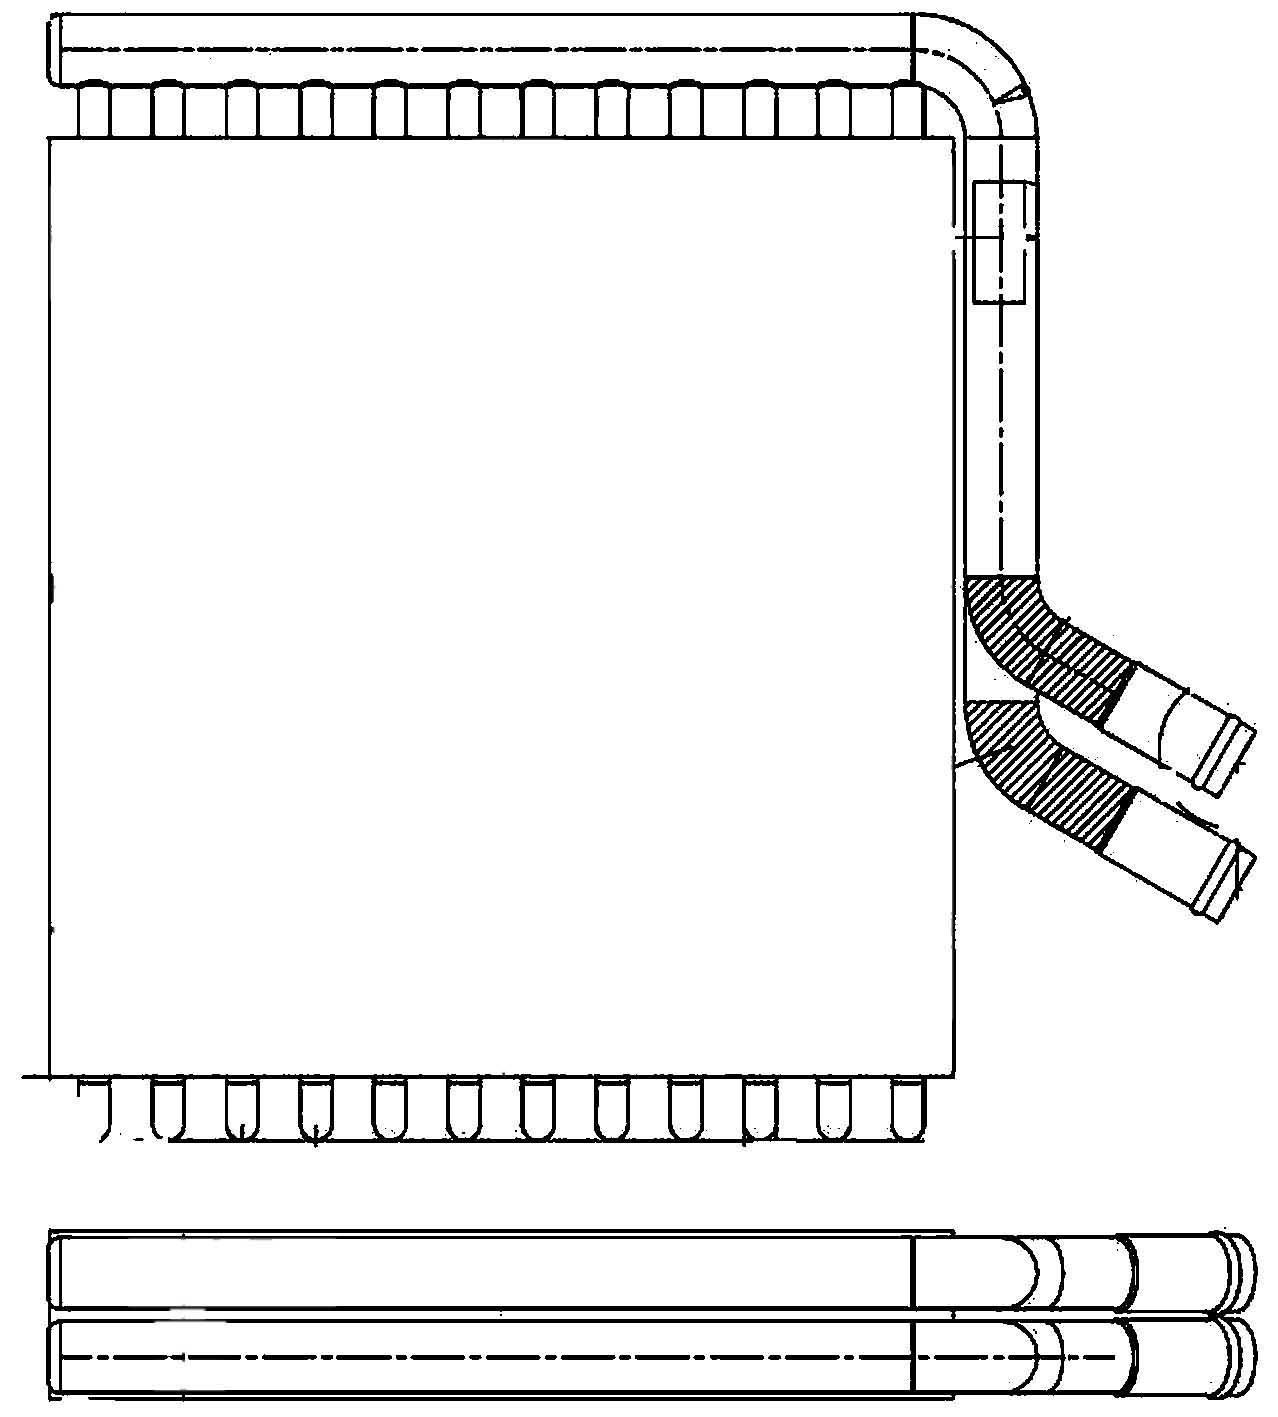 HELLA 351313581 Heater Core